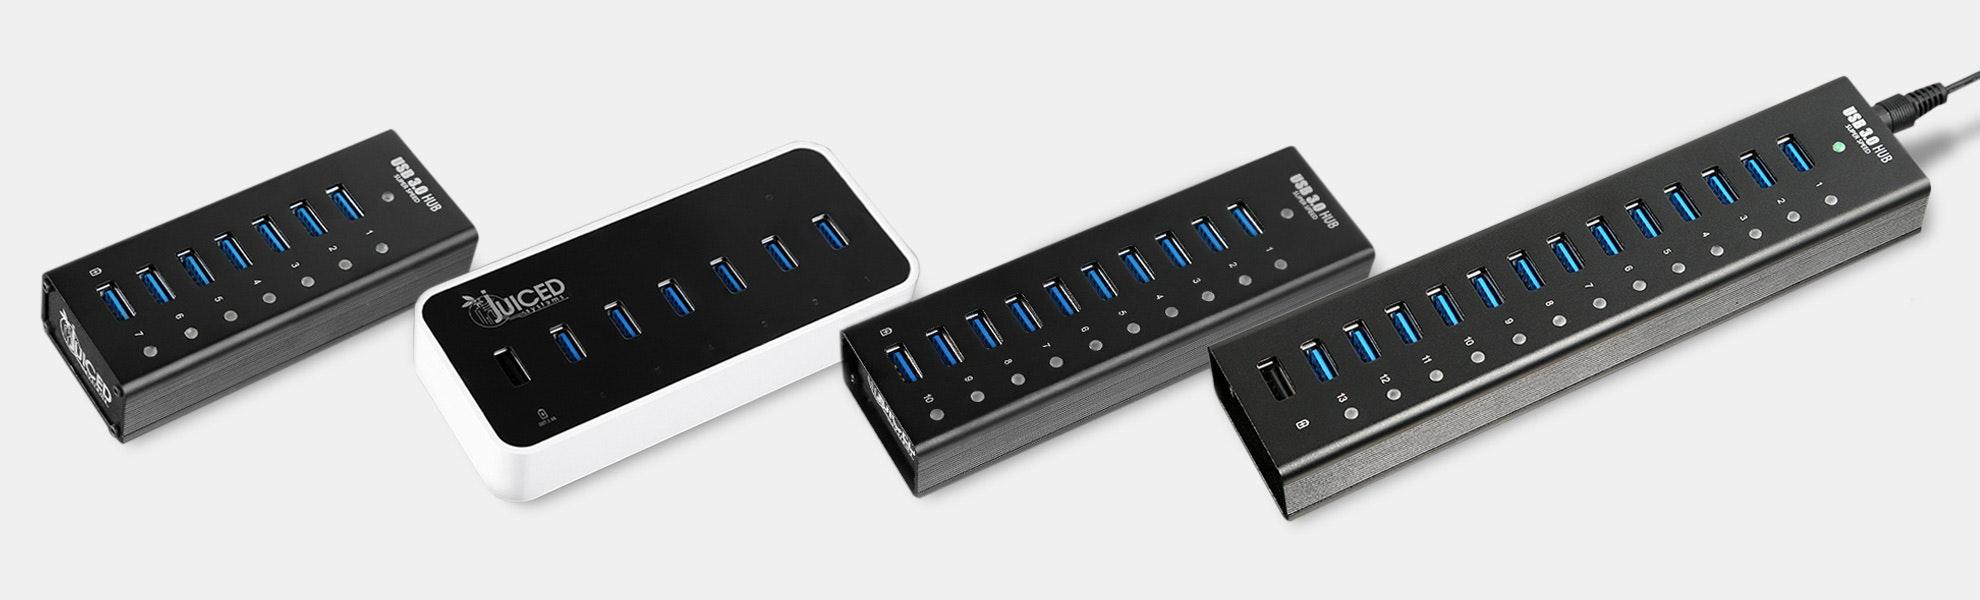 Juiced Systems USB 3.0 Hubs